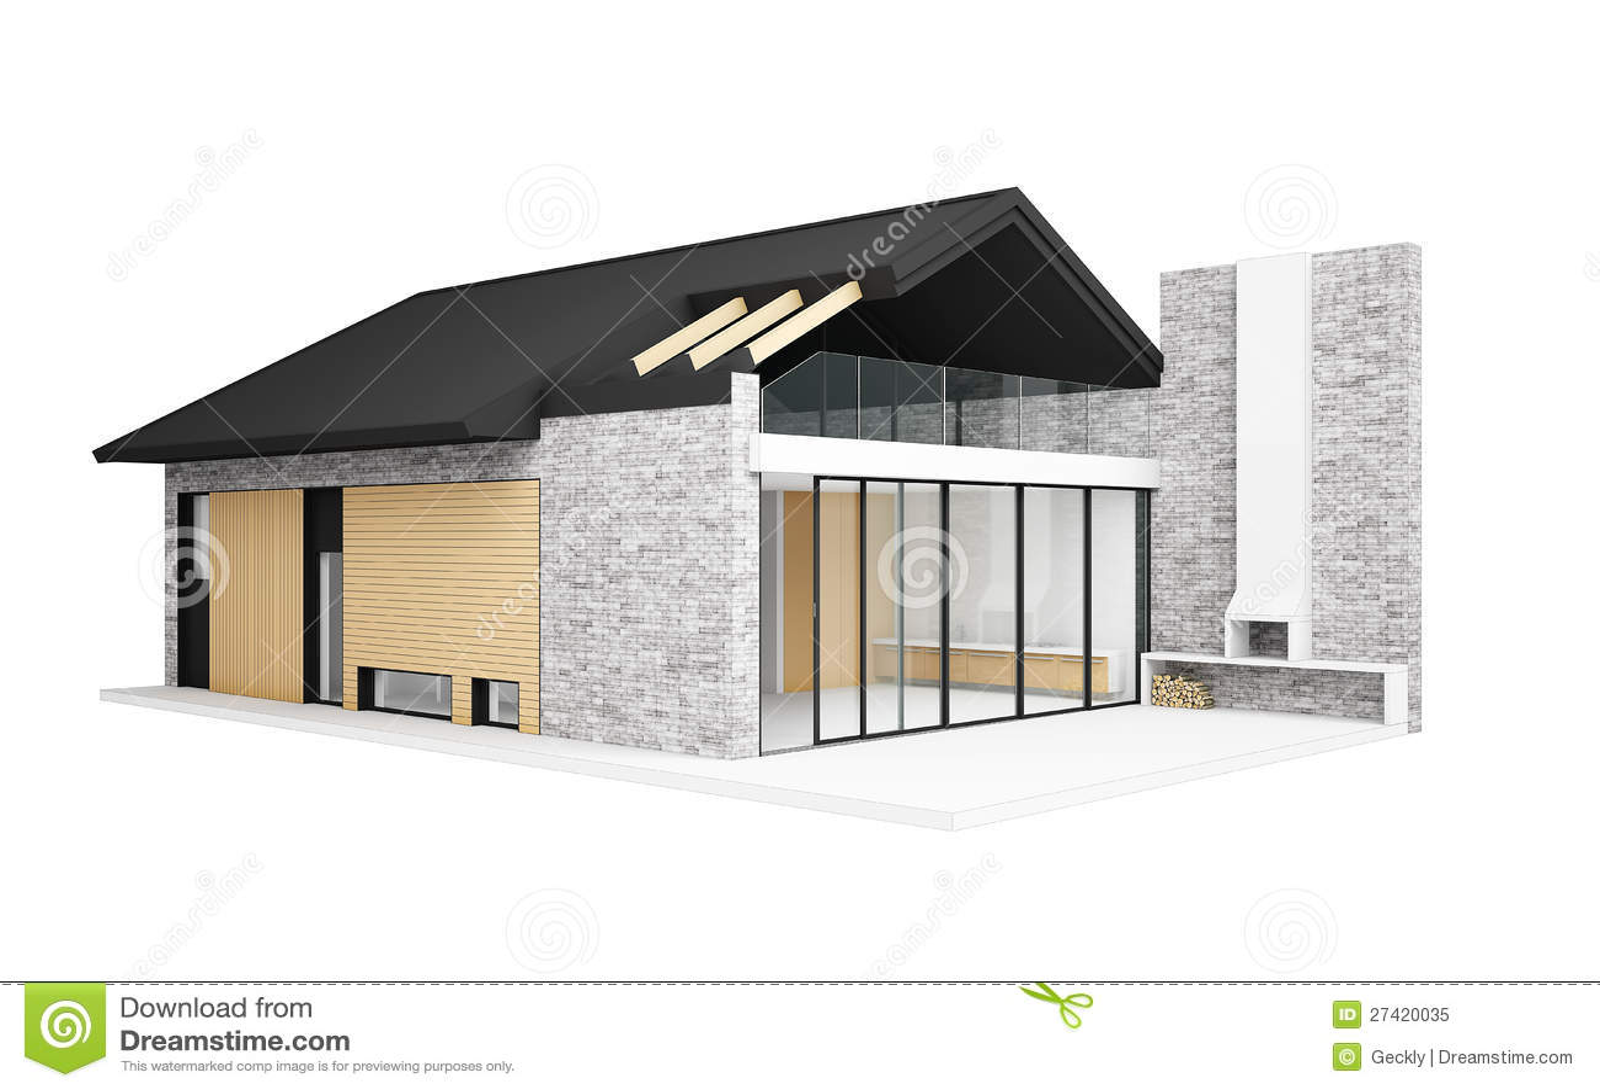 Kleines Modernes Haus Lizenzfreies Stockfoto - Bild: 27420035 size: 1300 x 903 post ID: 8 File size: 0 B